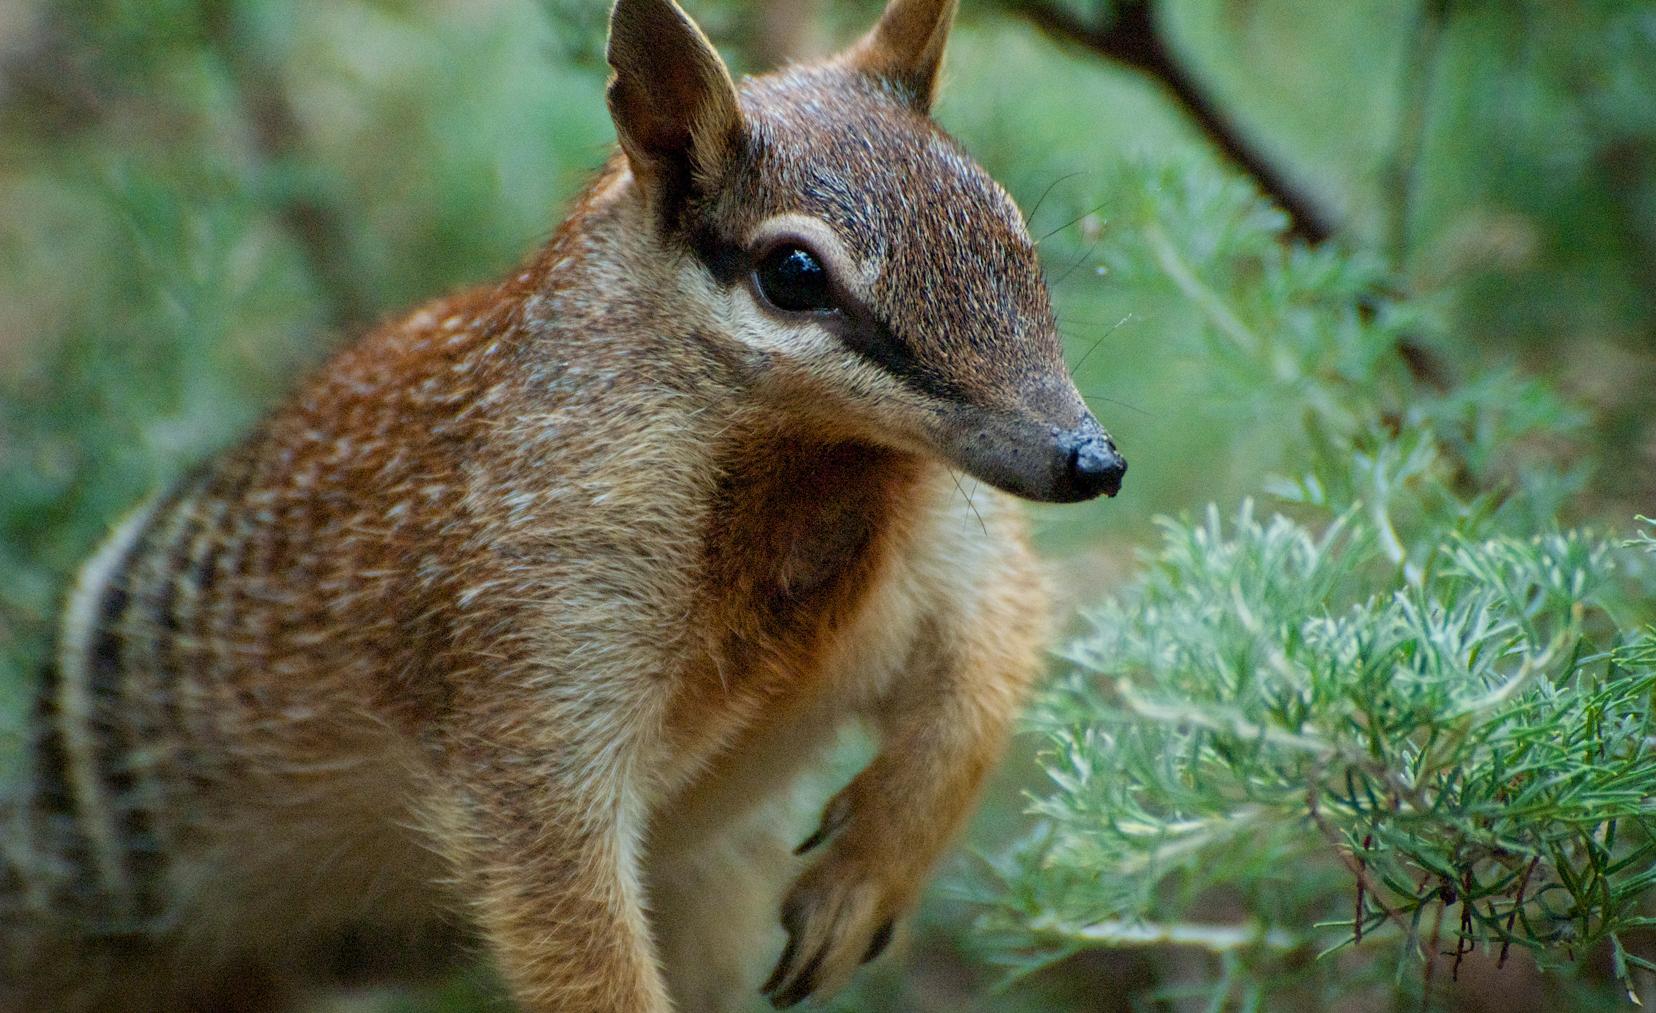 Numbat aka banded anteater (dilettantiquity via flickr.com)